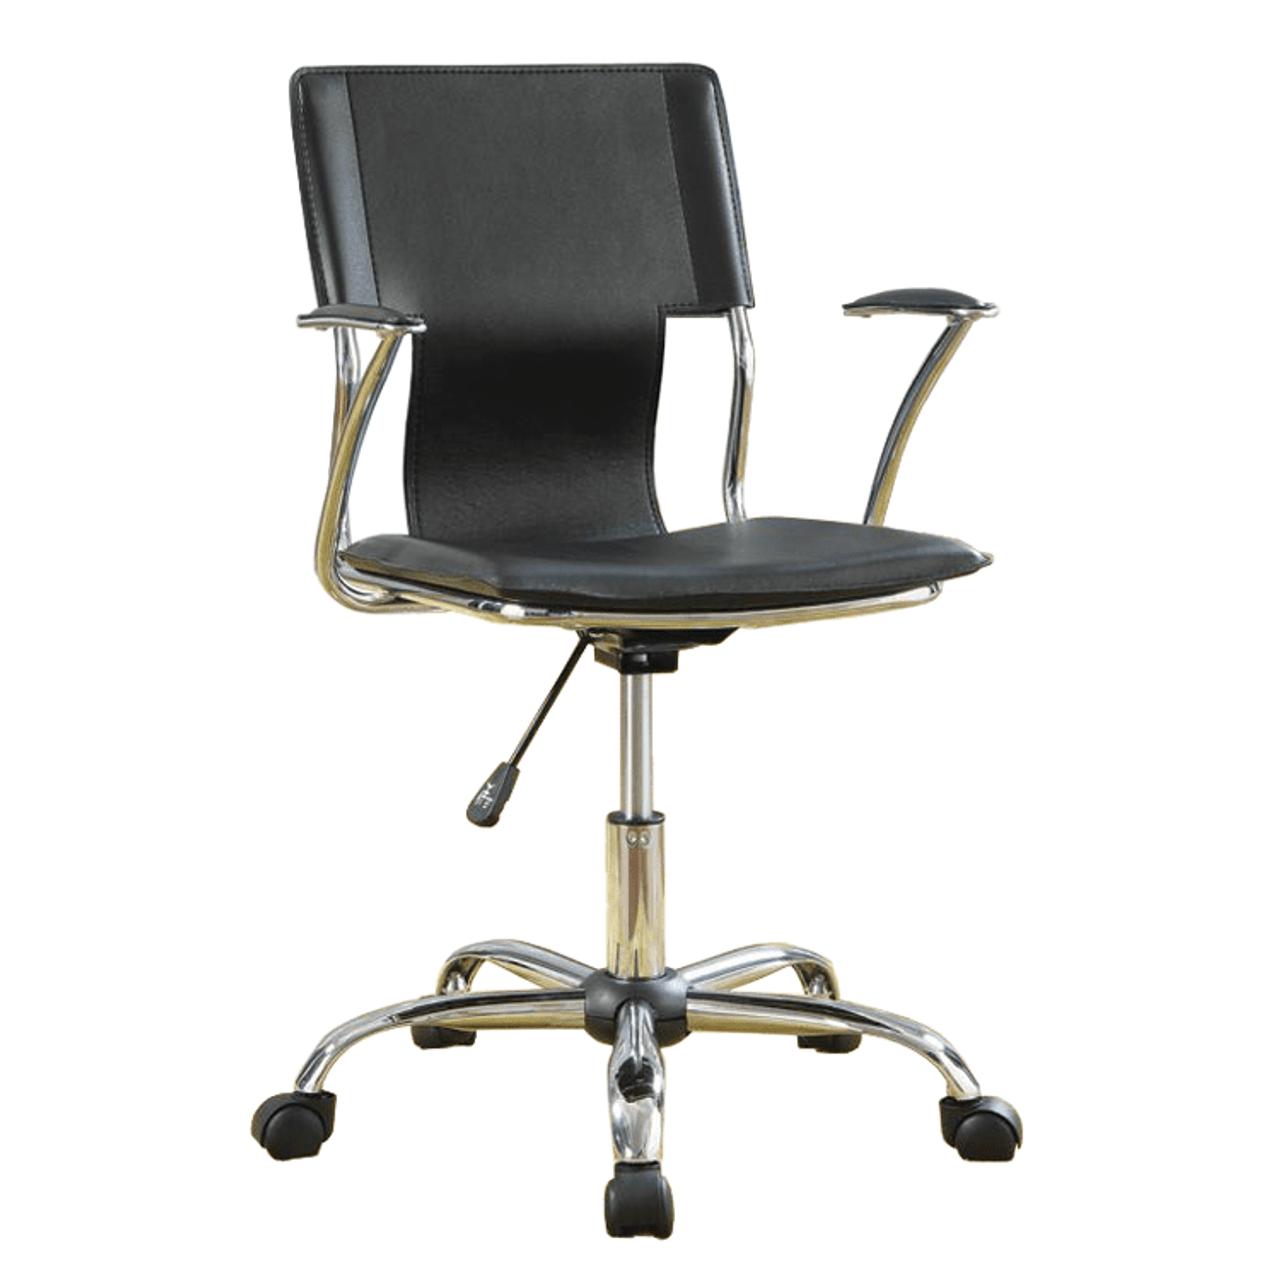 Image of: Coaster 800207 Swivel Desk Chair Black Tucker S Valley Furniture